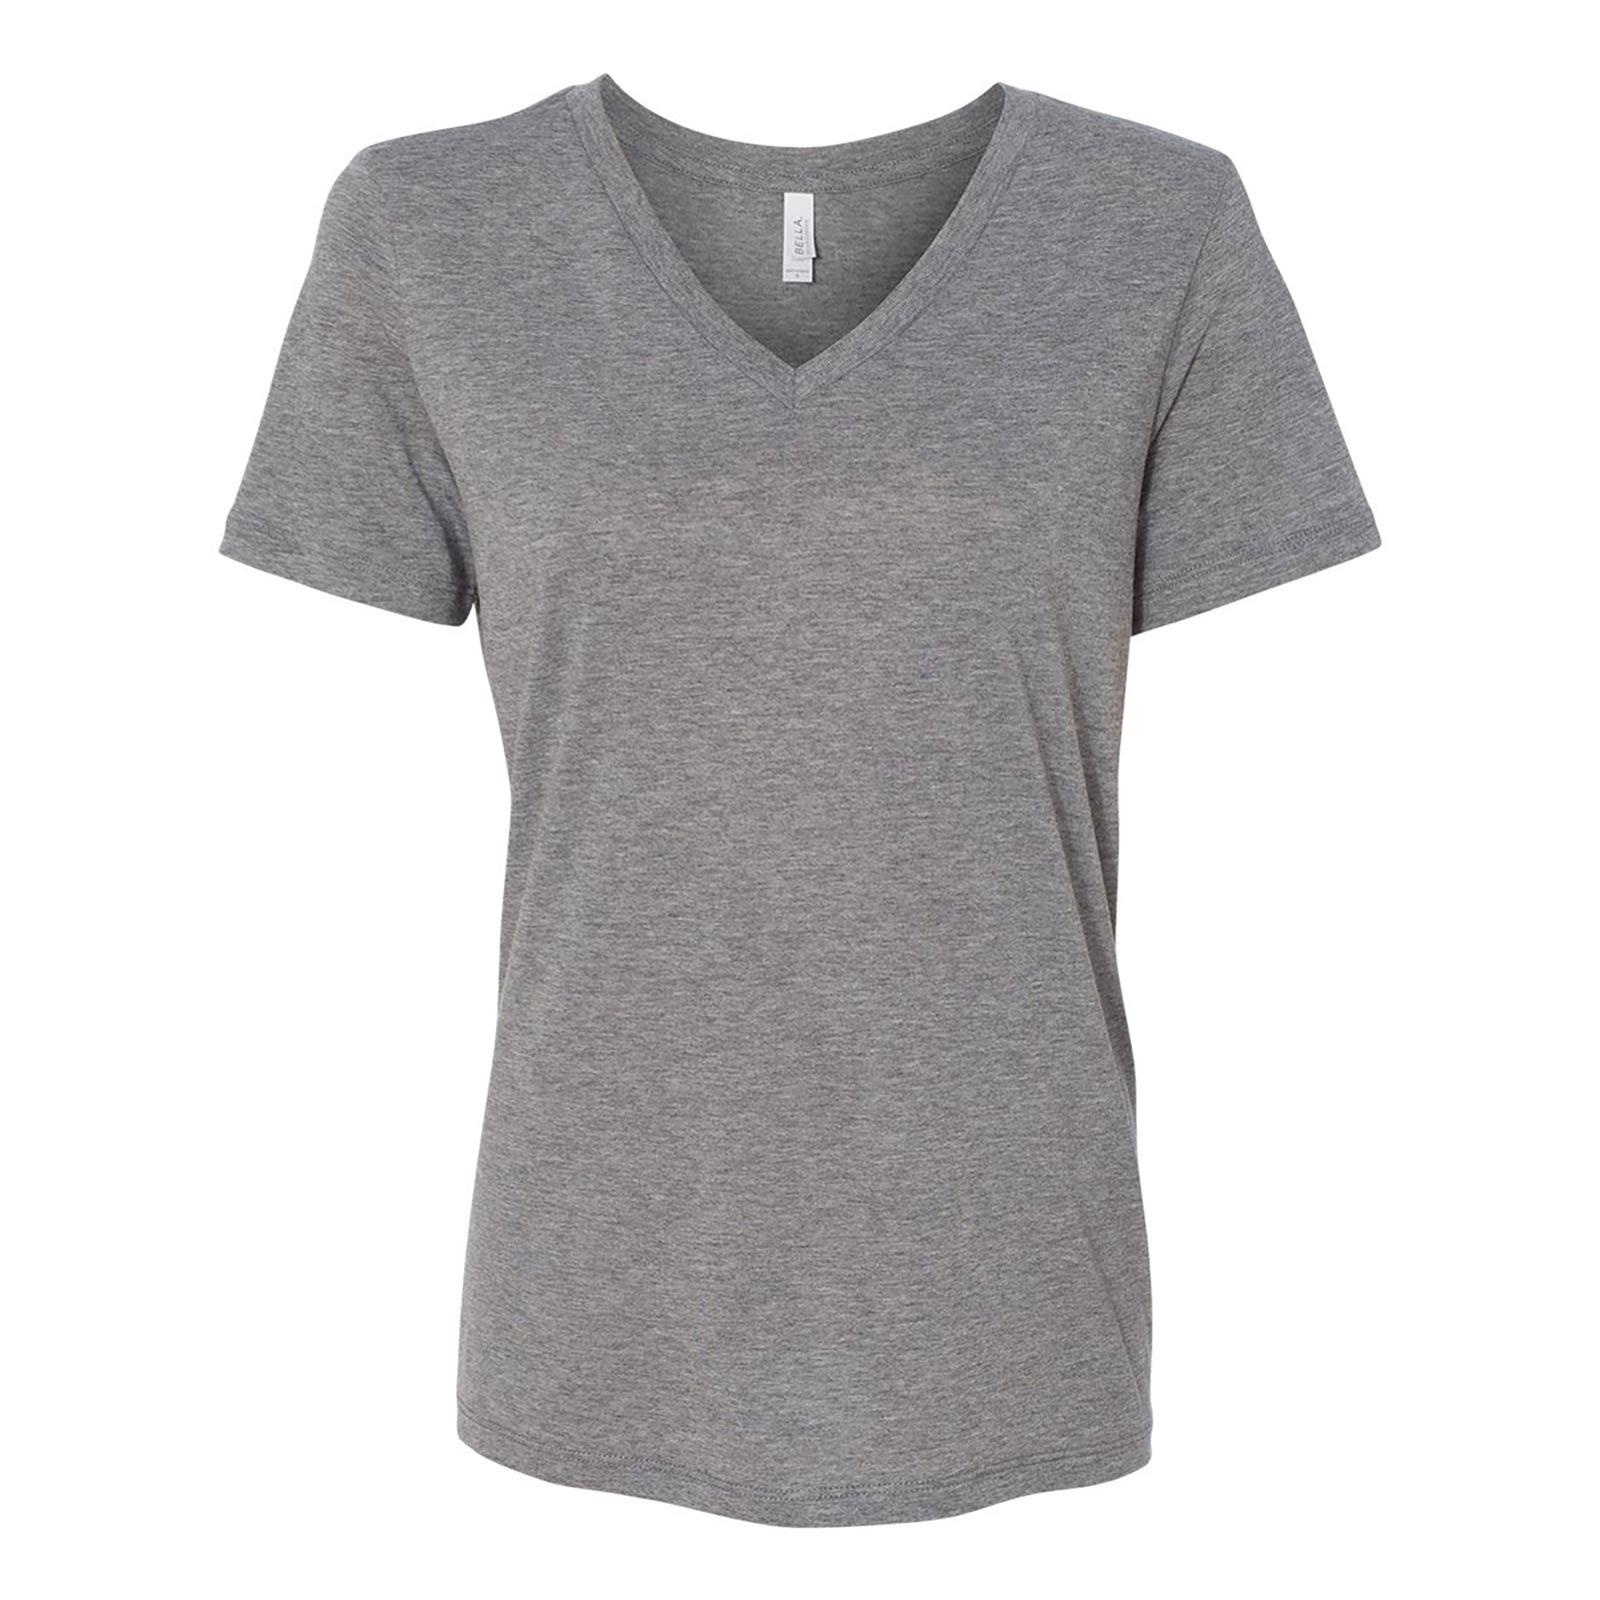 Gray triblend